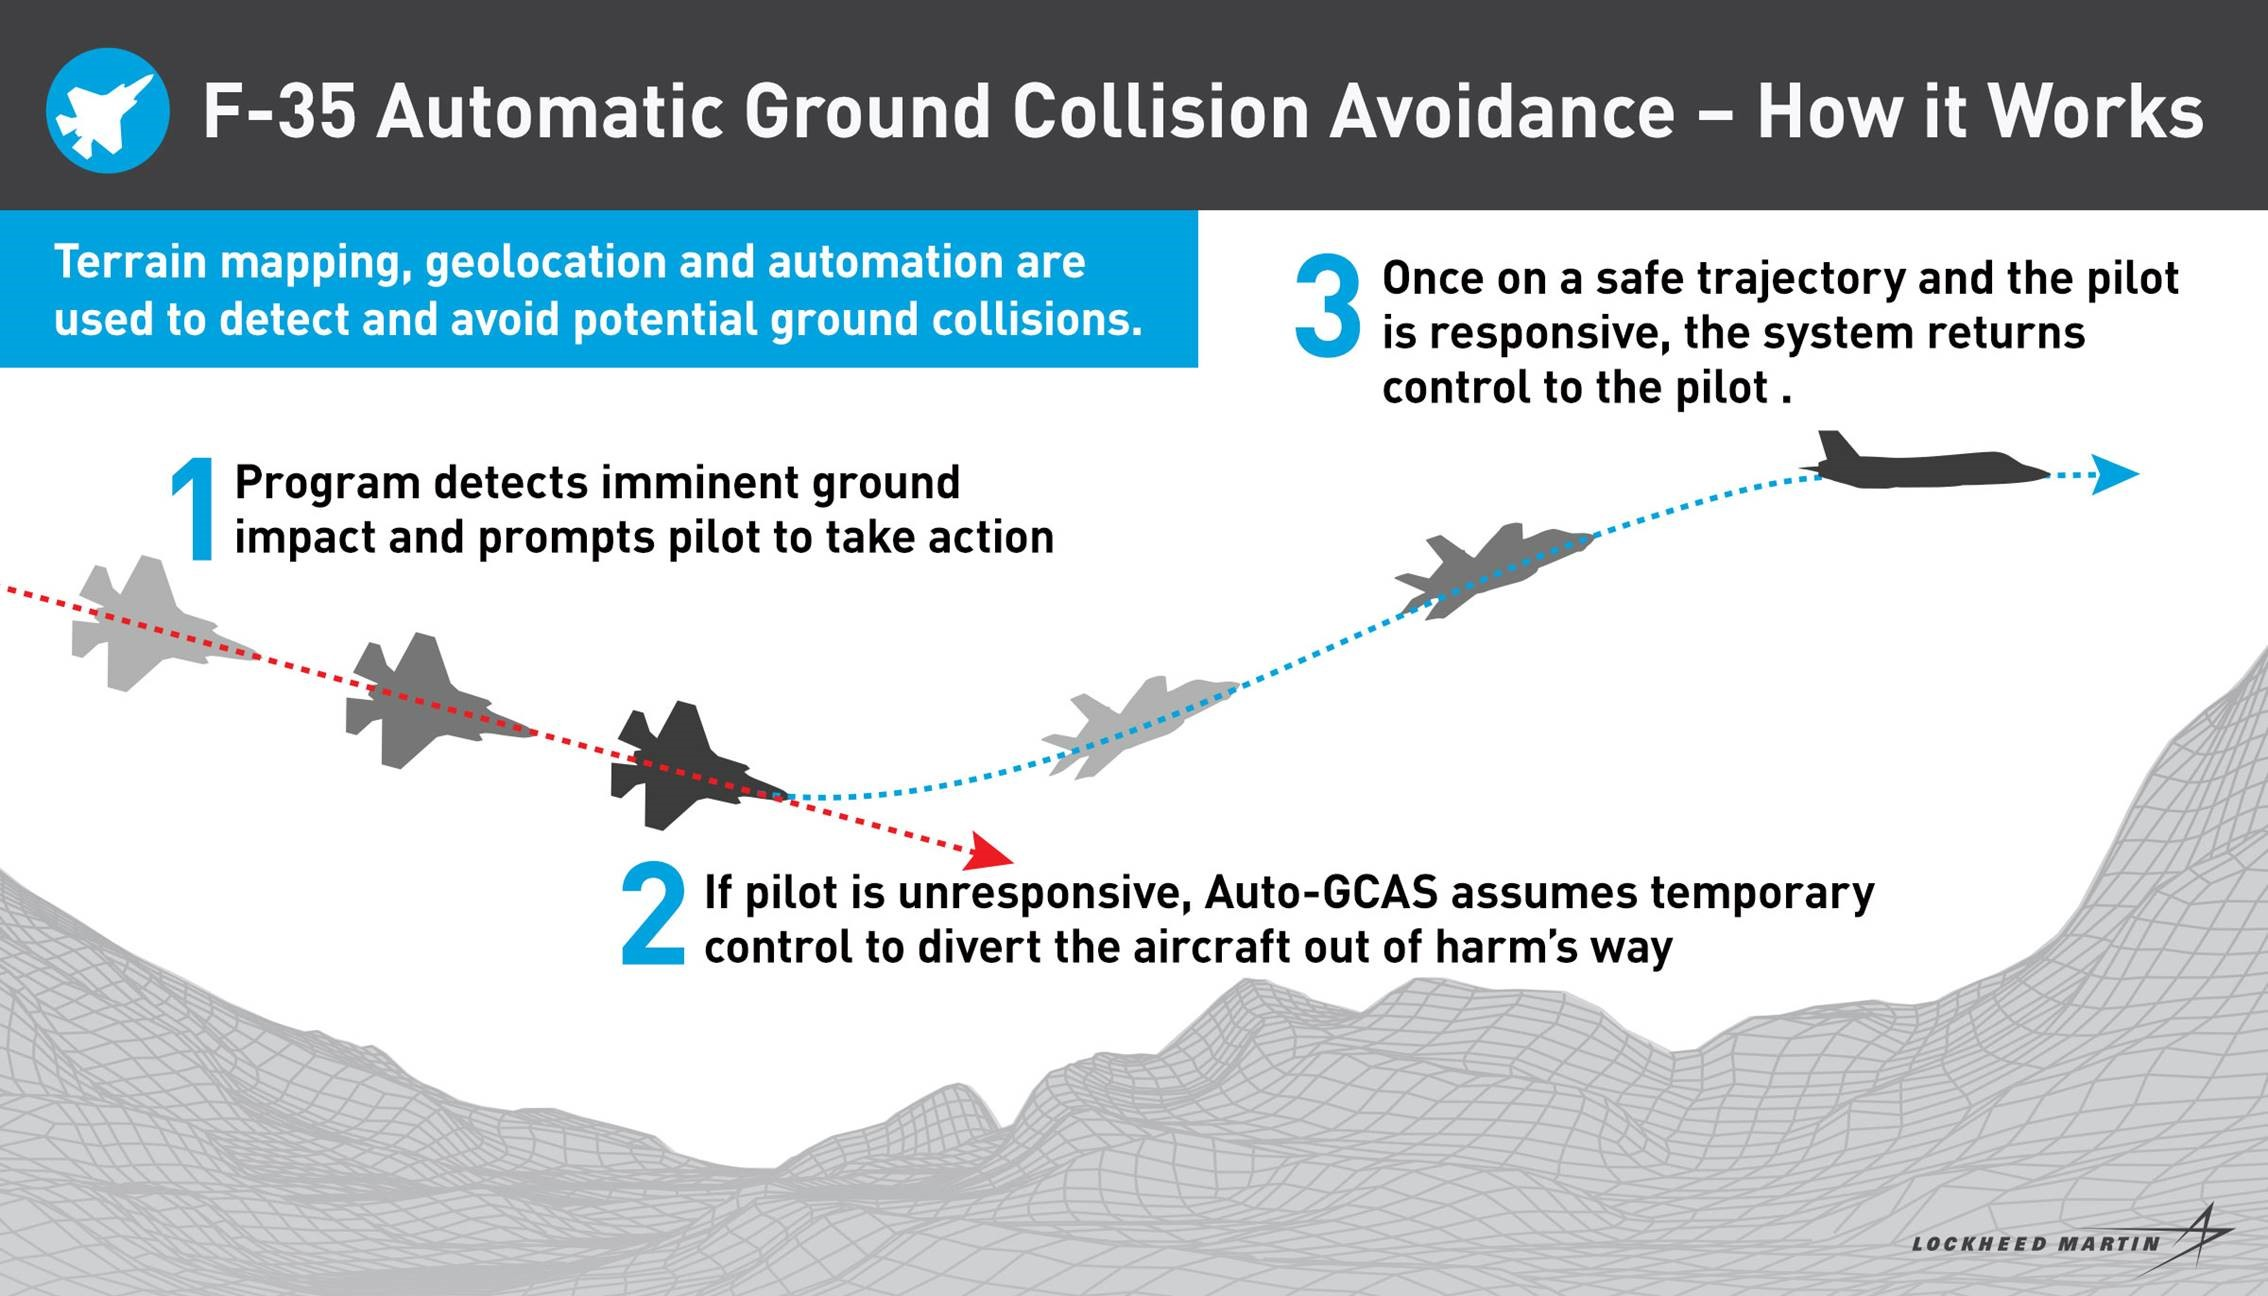 F-35 Automatic ground collision avoidance